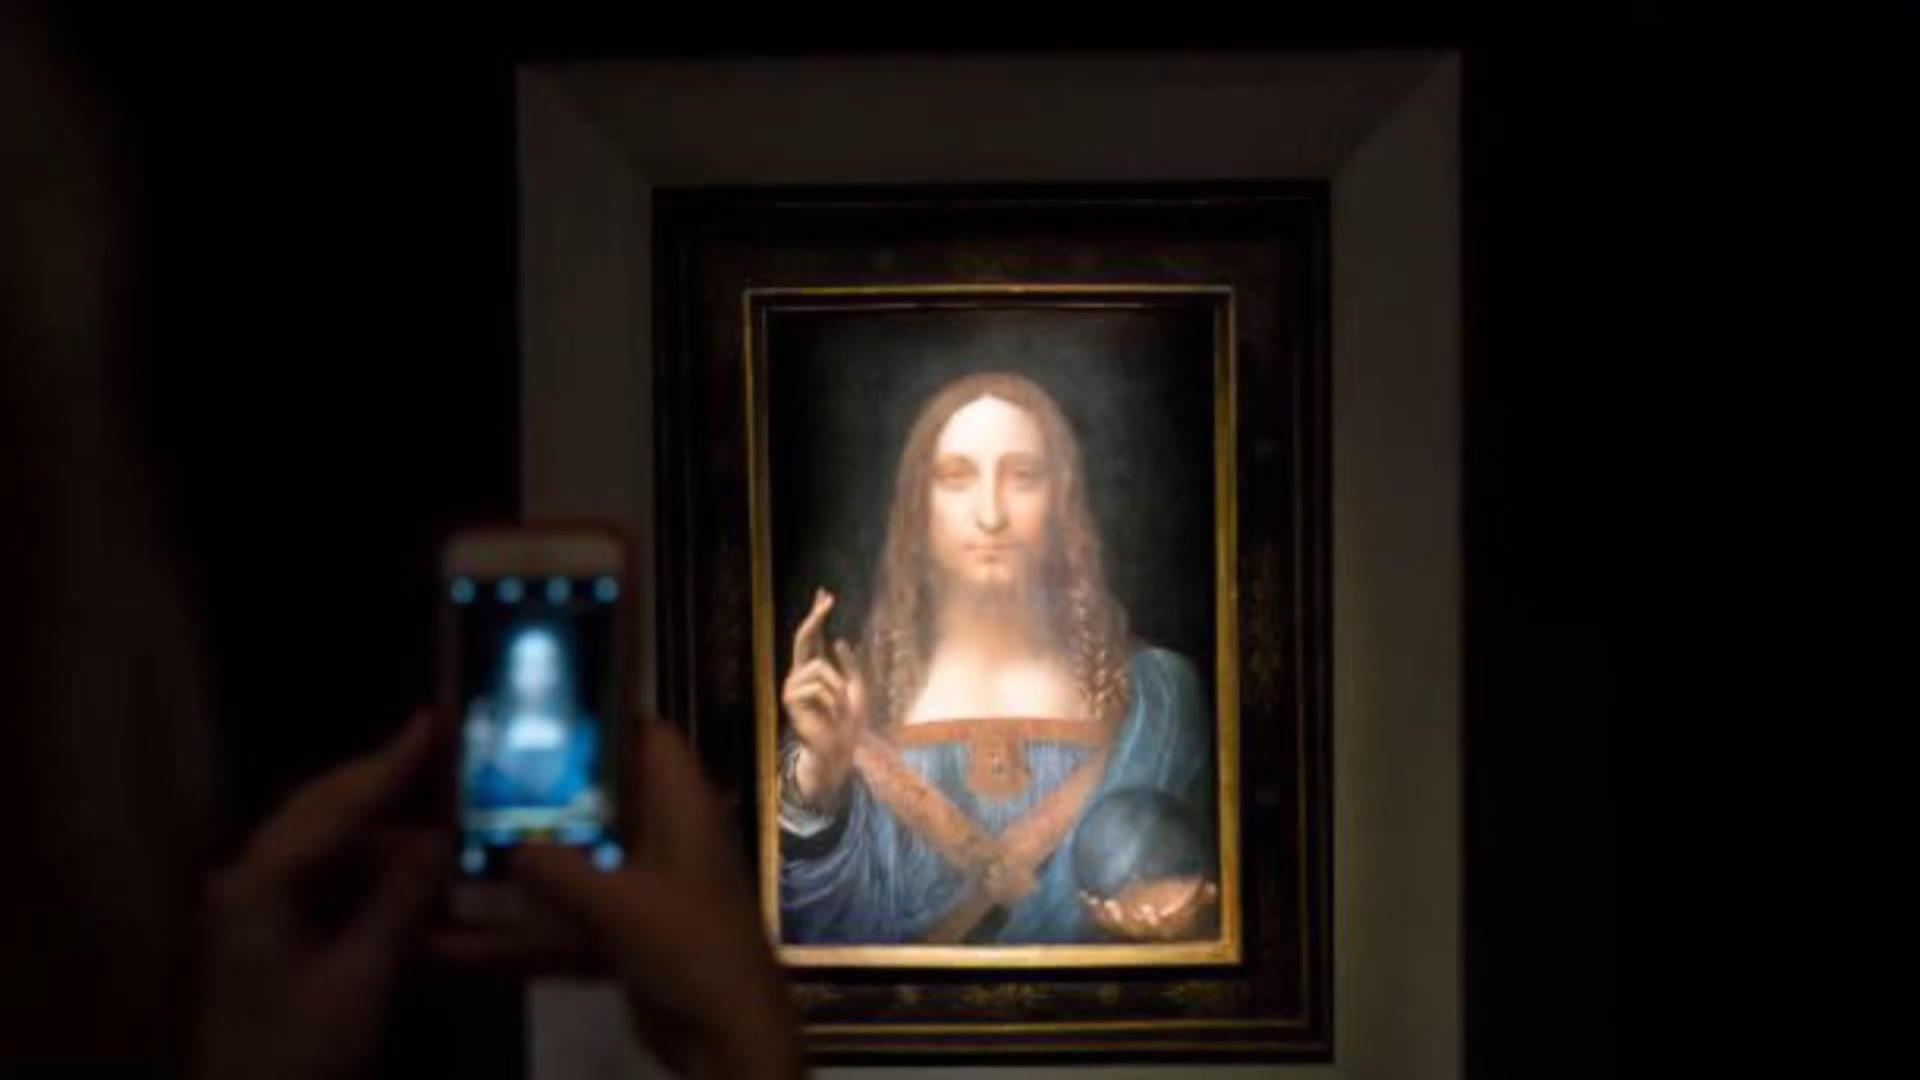 Da Vinci's $450 Million Masterpiece Is Kept on Saudi Prince's Yacht